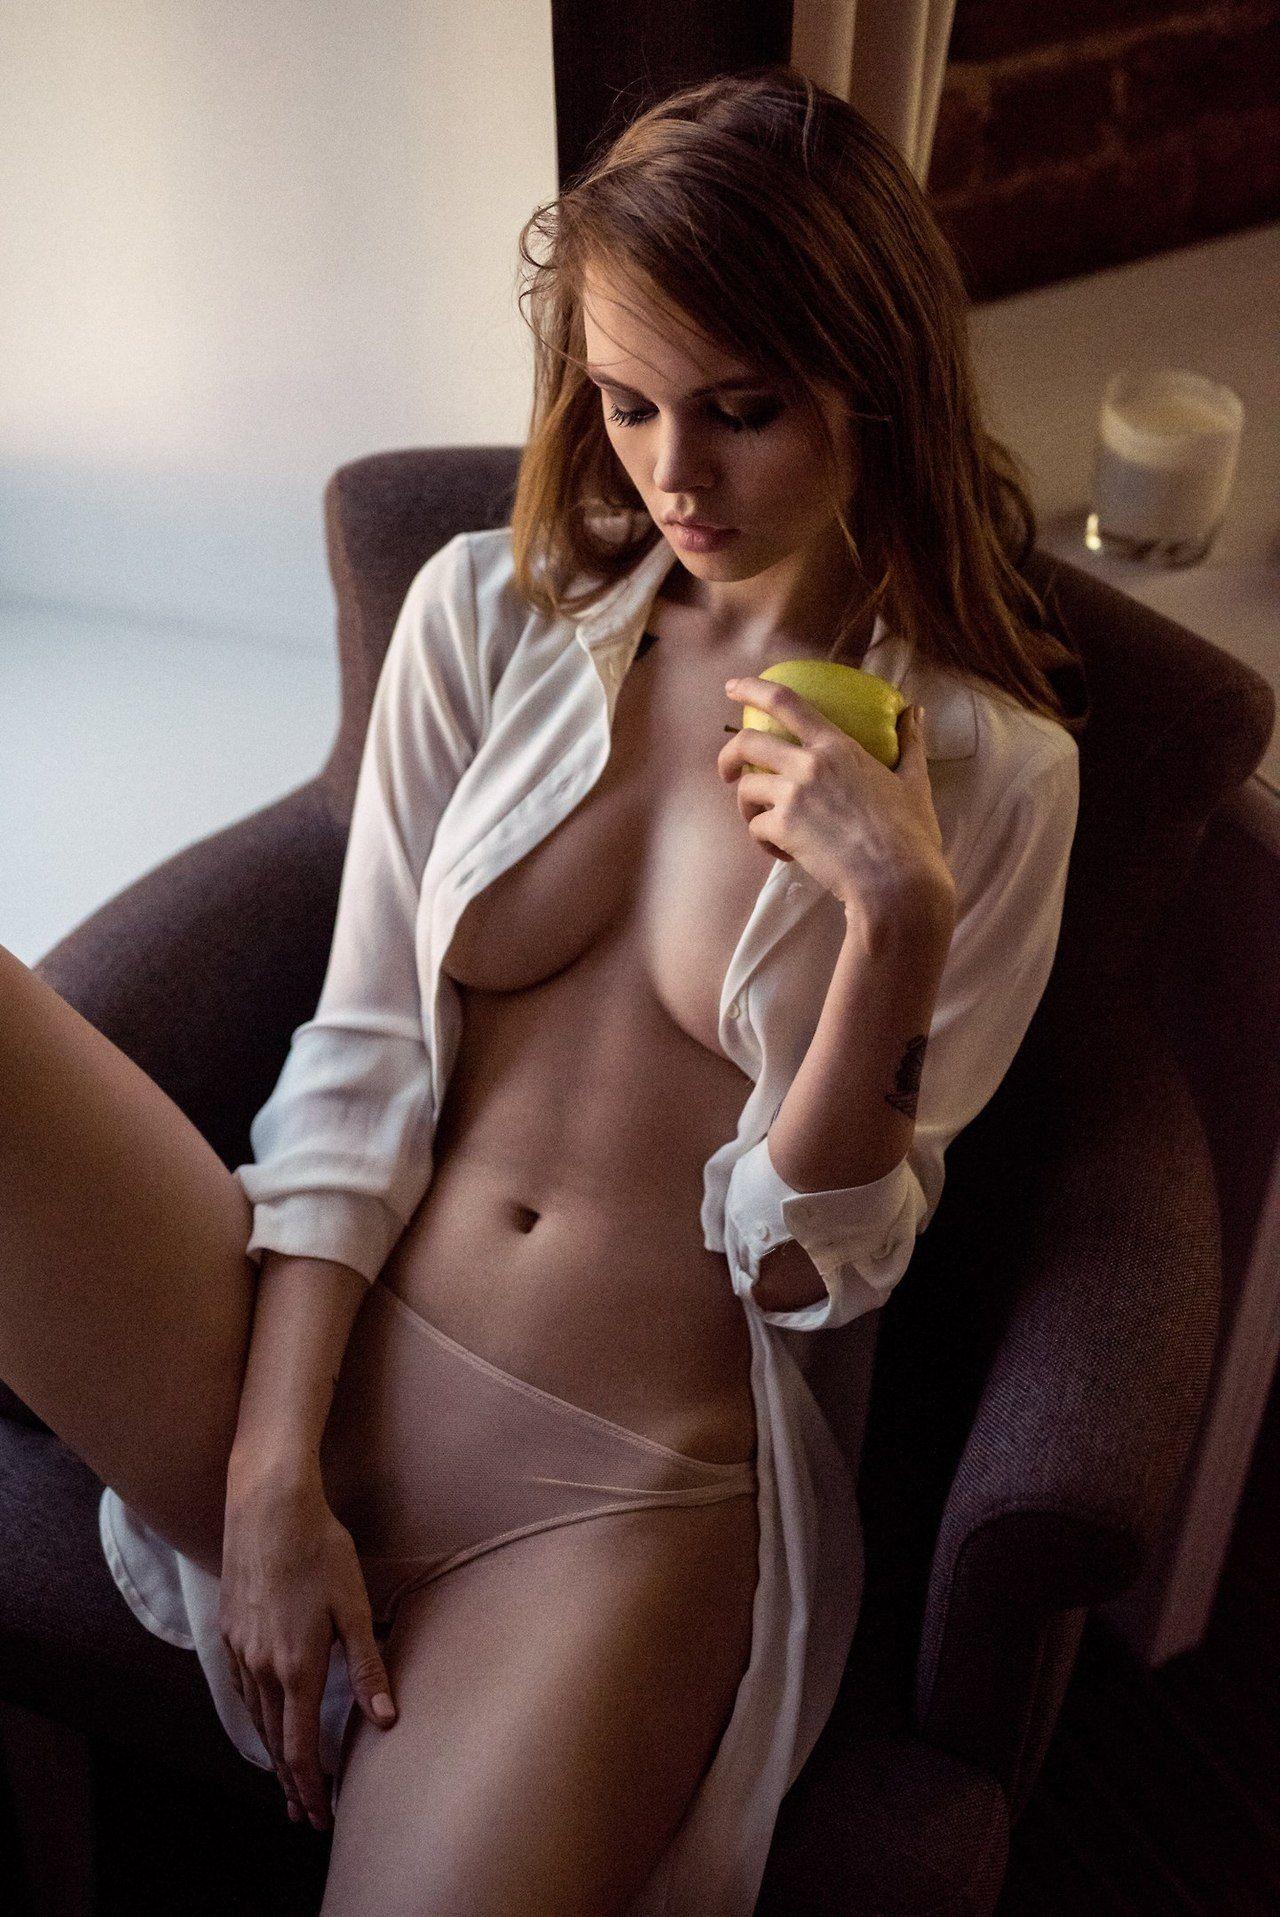 Pussy Valerie van der Graaf nude photos 2019